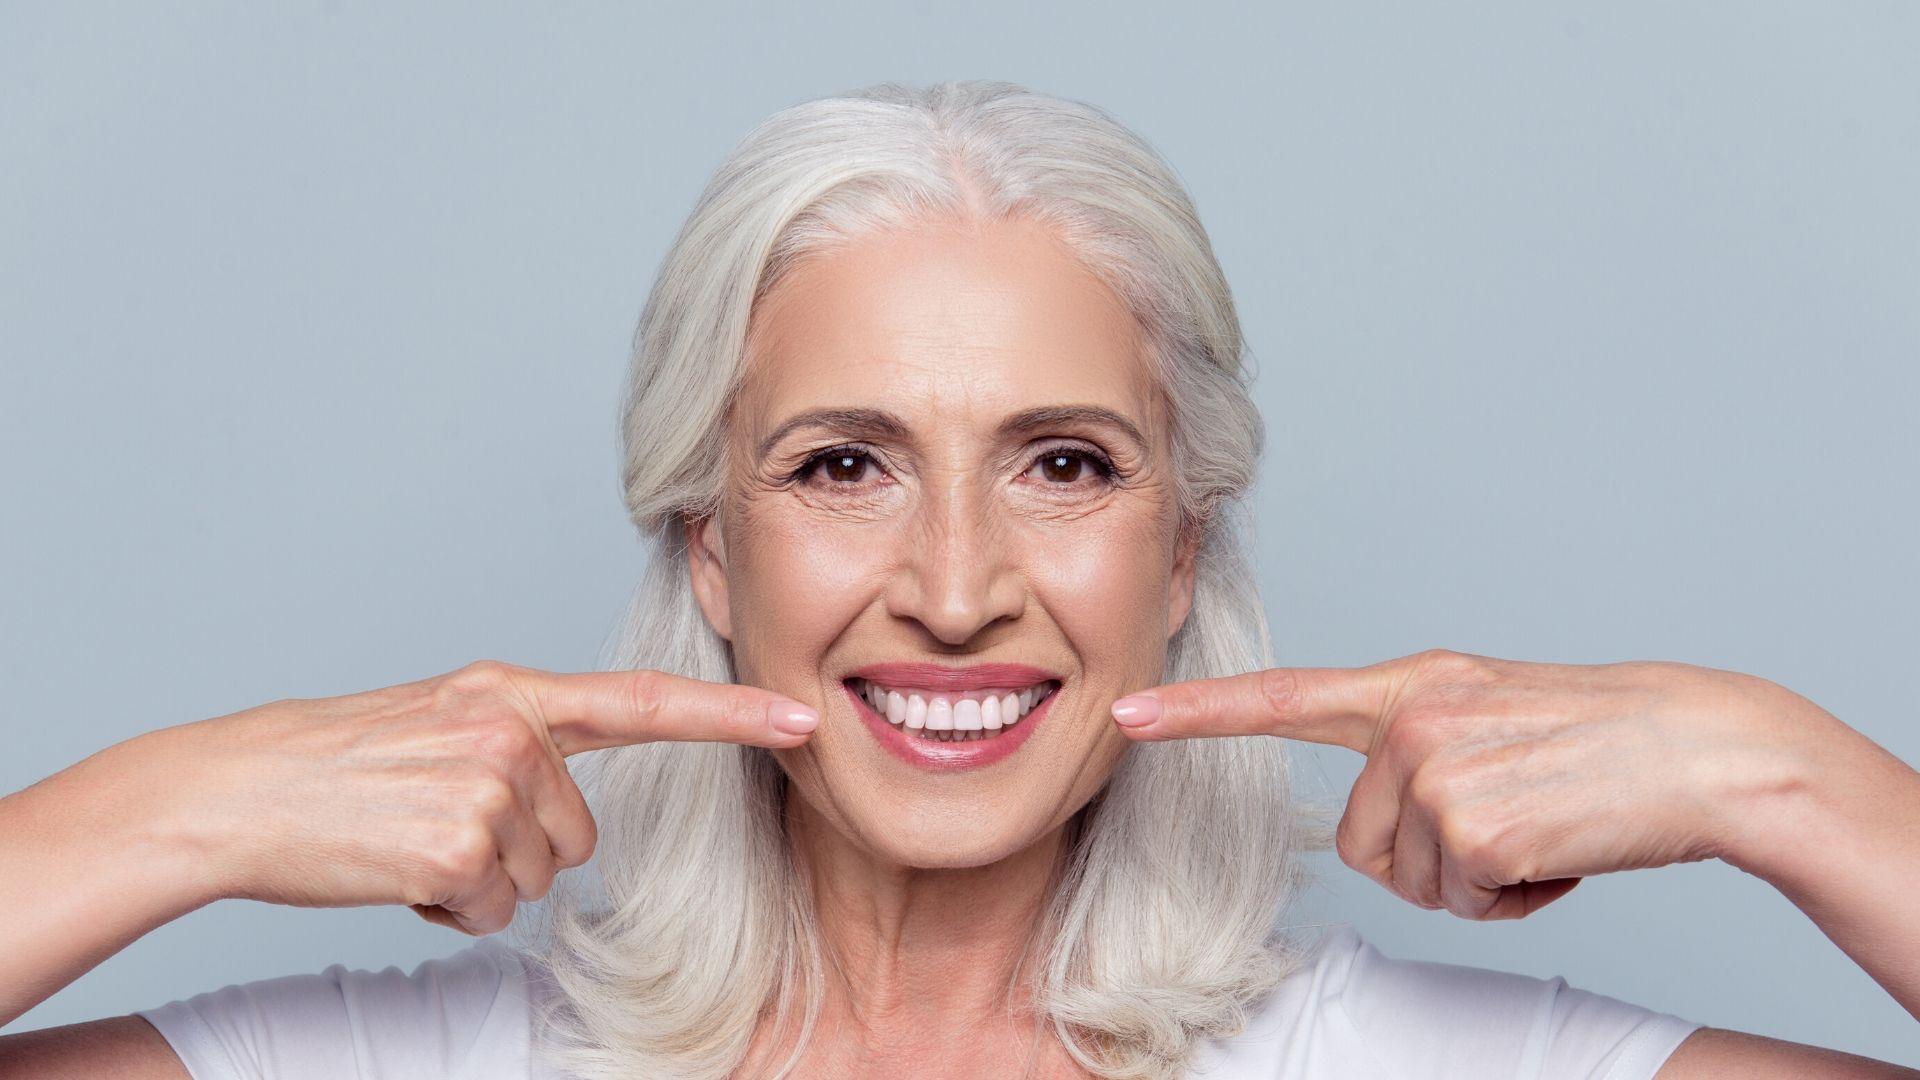 Blanchir les dents remède grand-mère